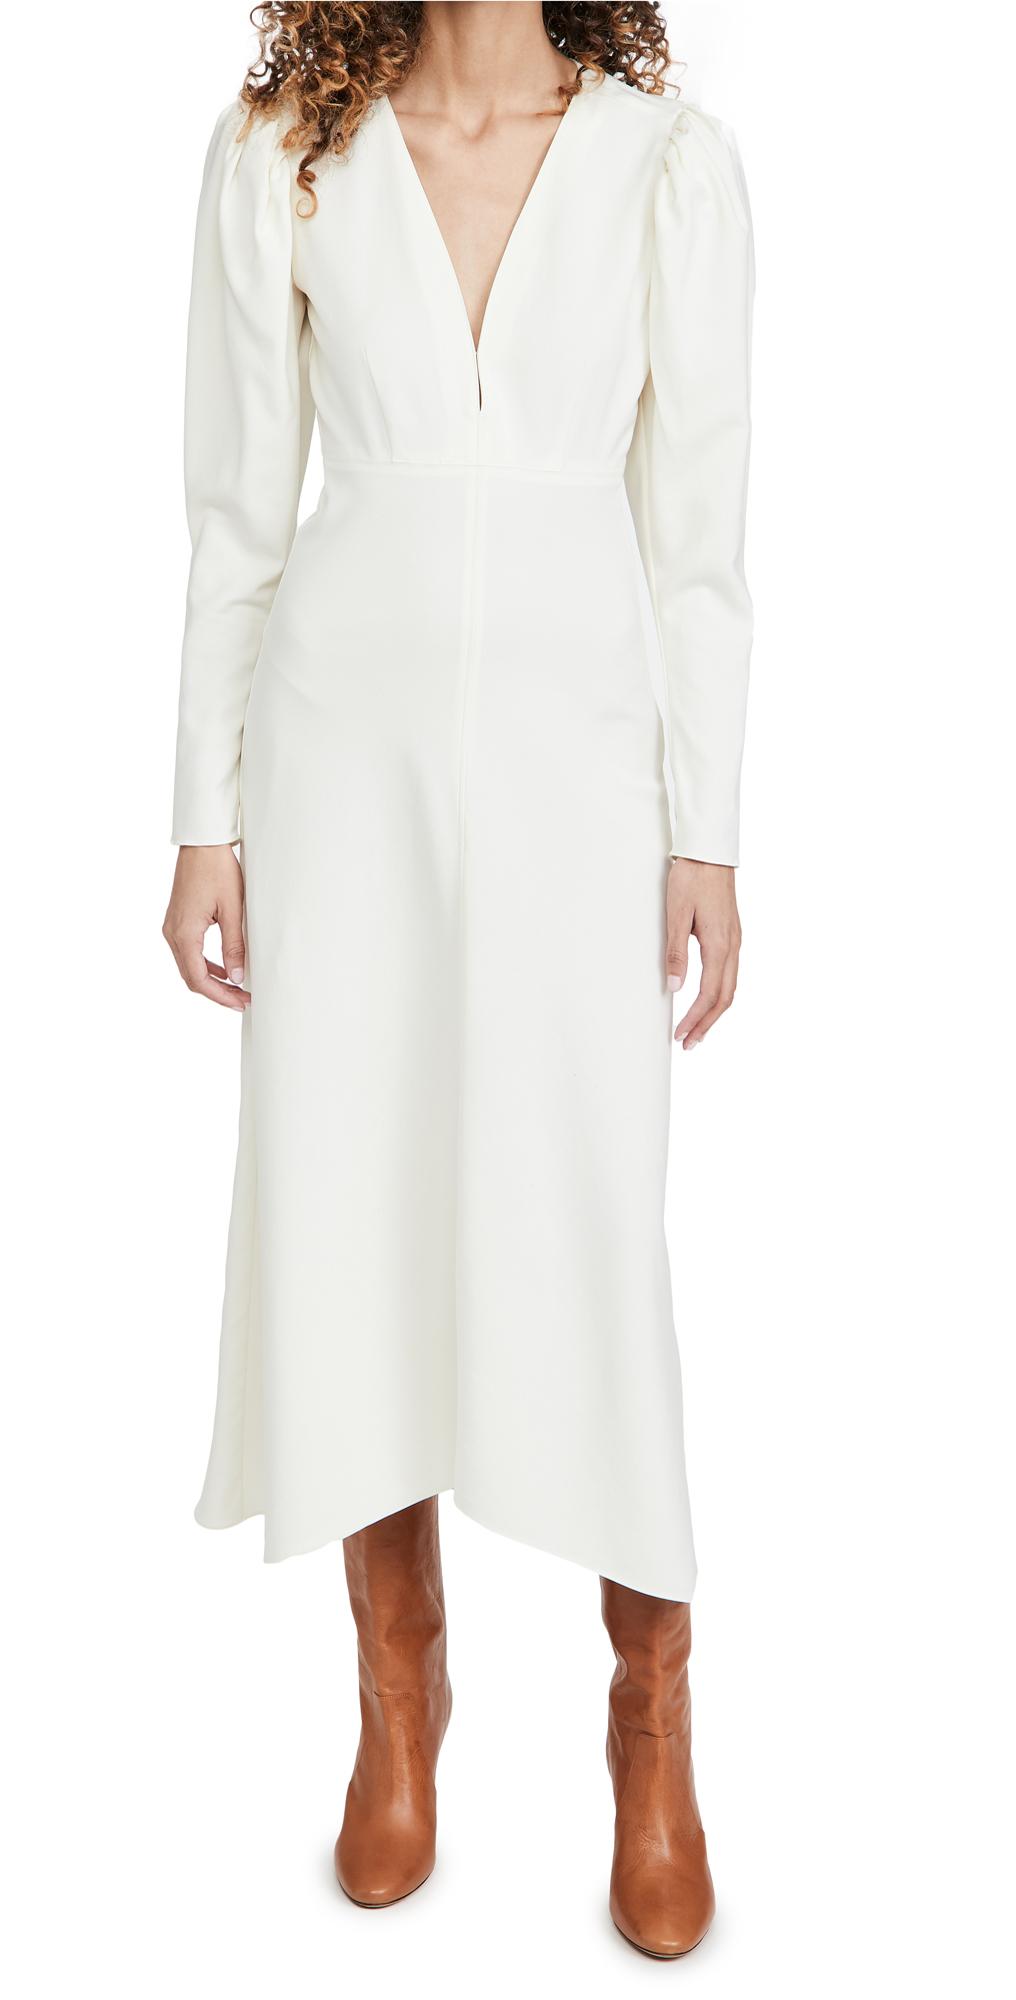 Isabel Marant Silabi Dress